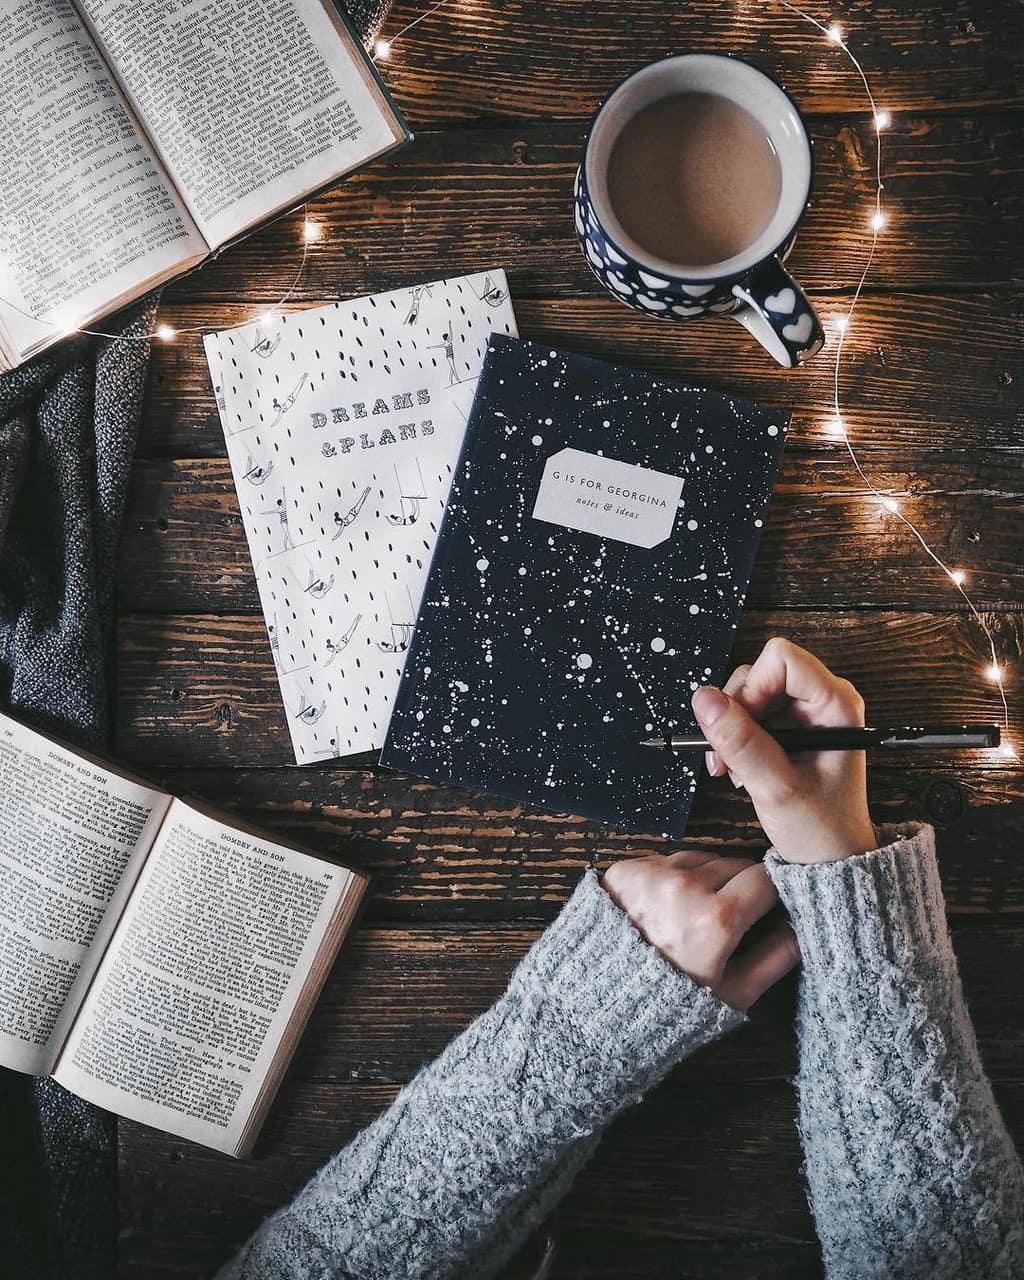 book, books, and bookshelves image